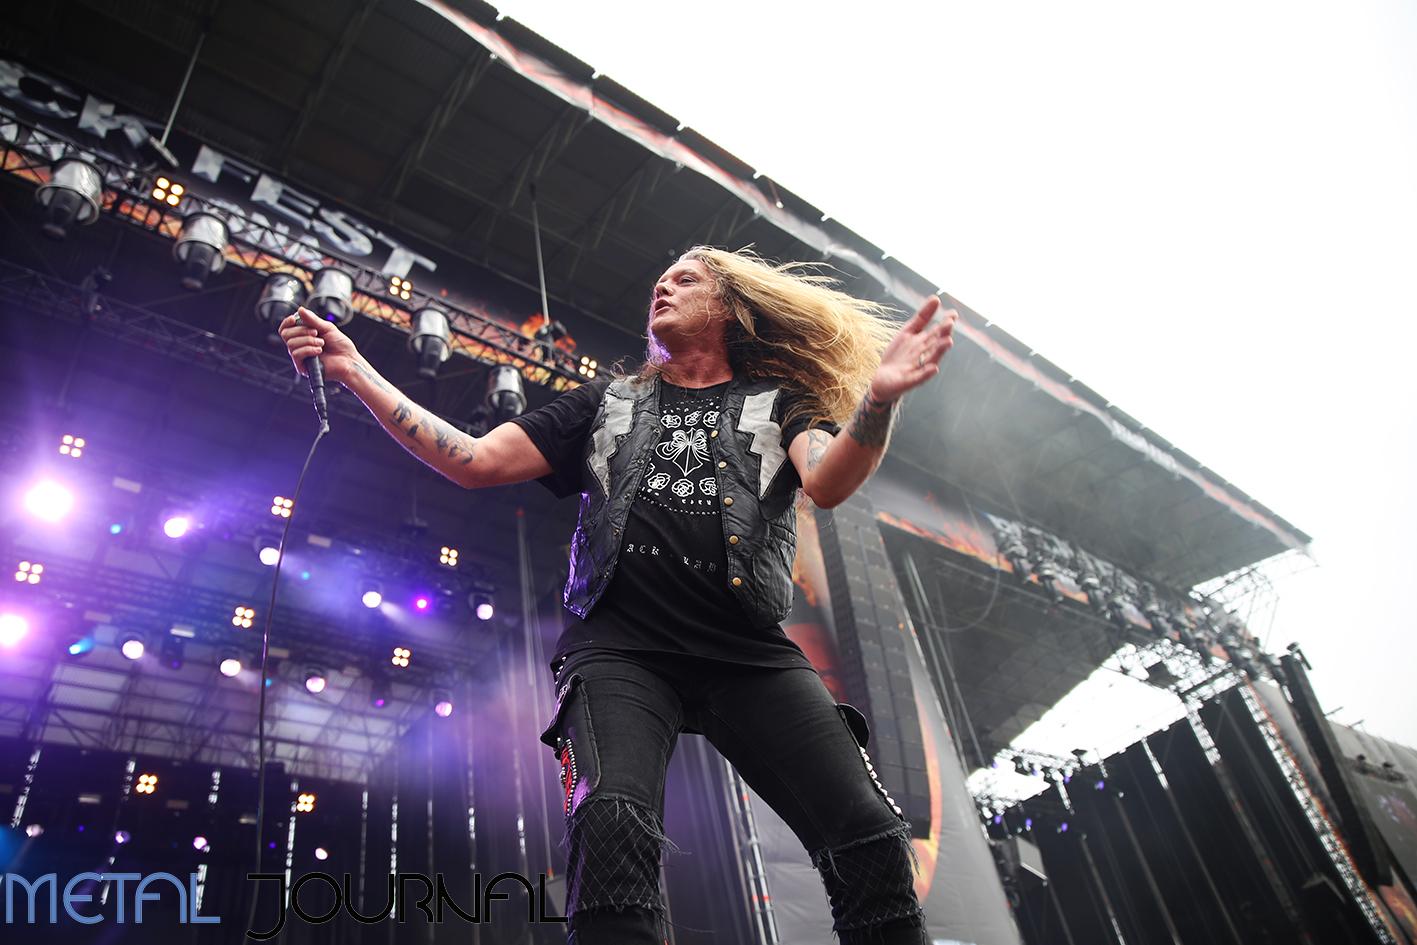 sebastian bach - metal journal rock fest barcelona 2019 pic 1